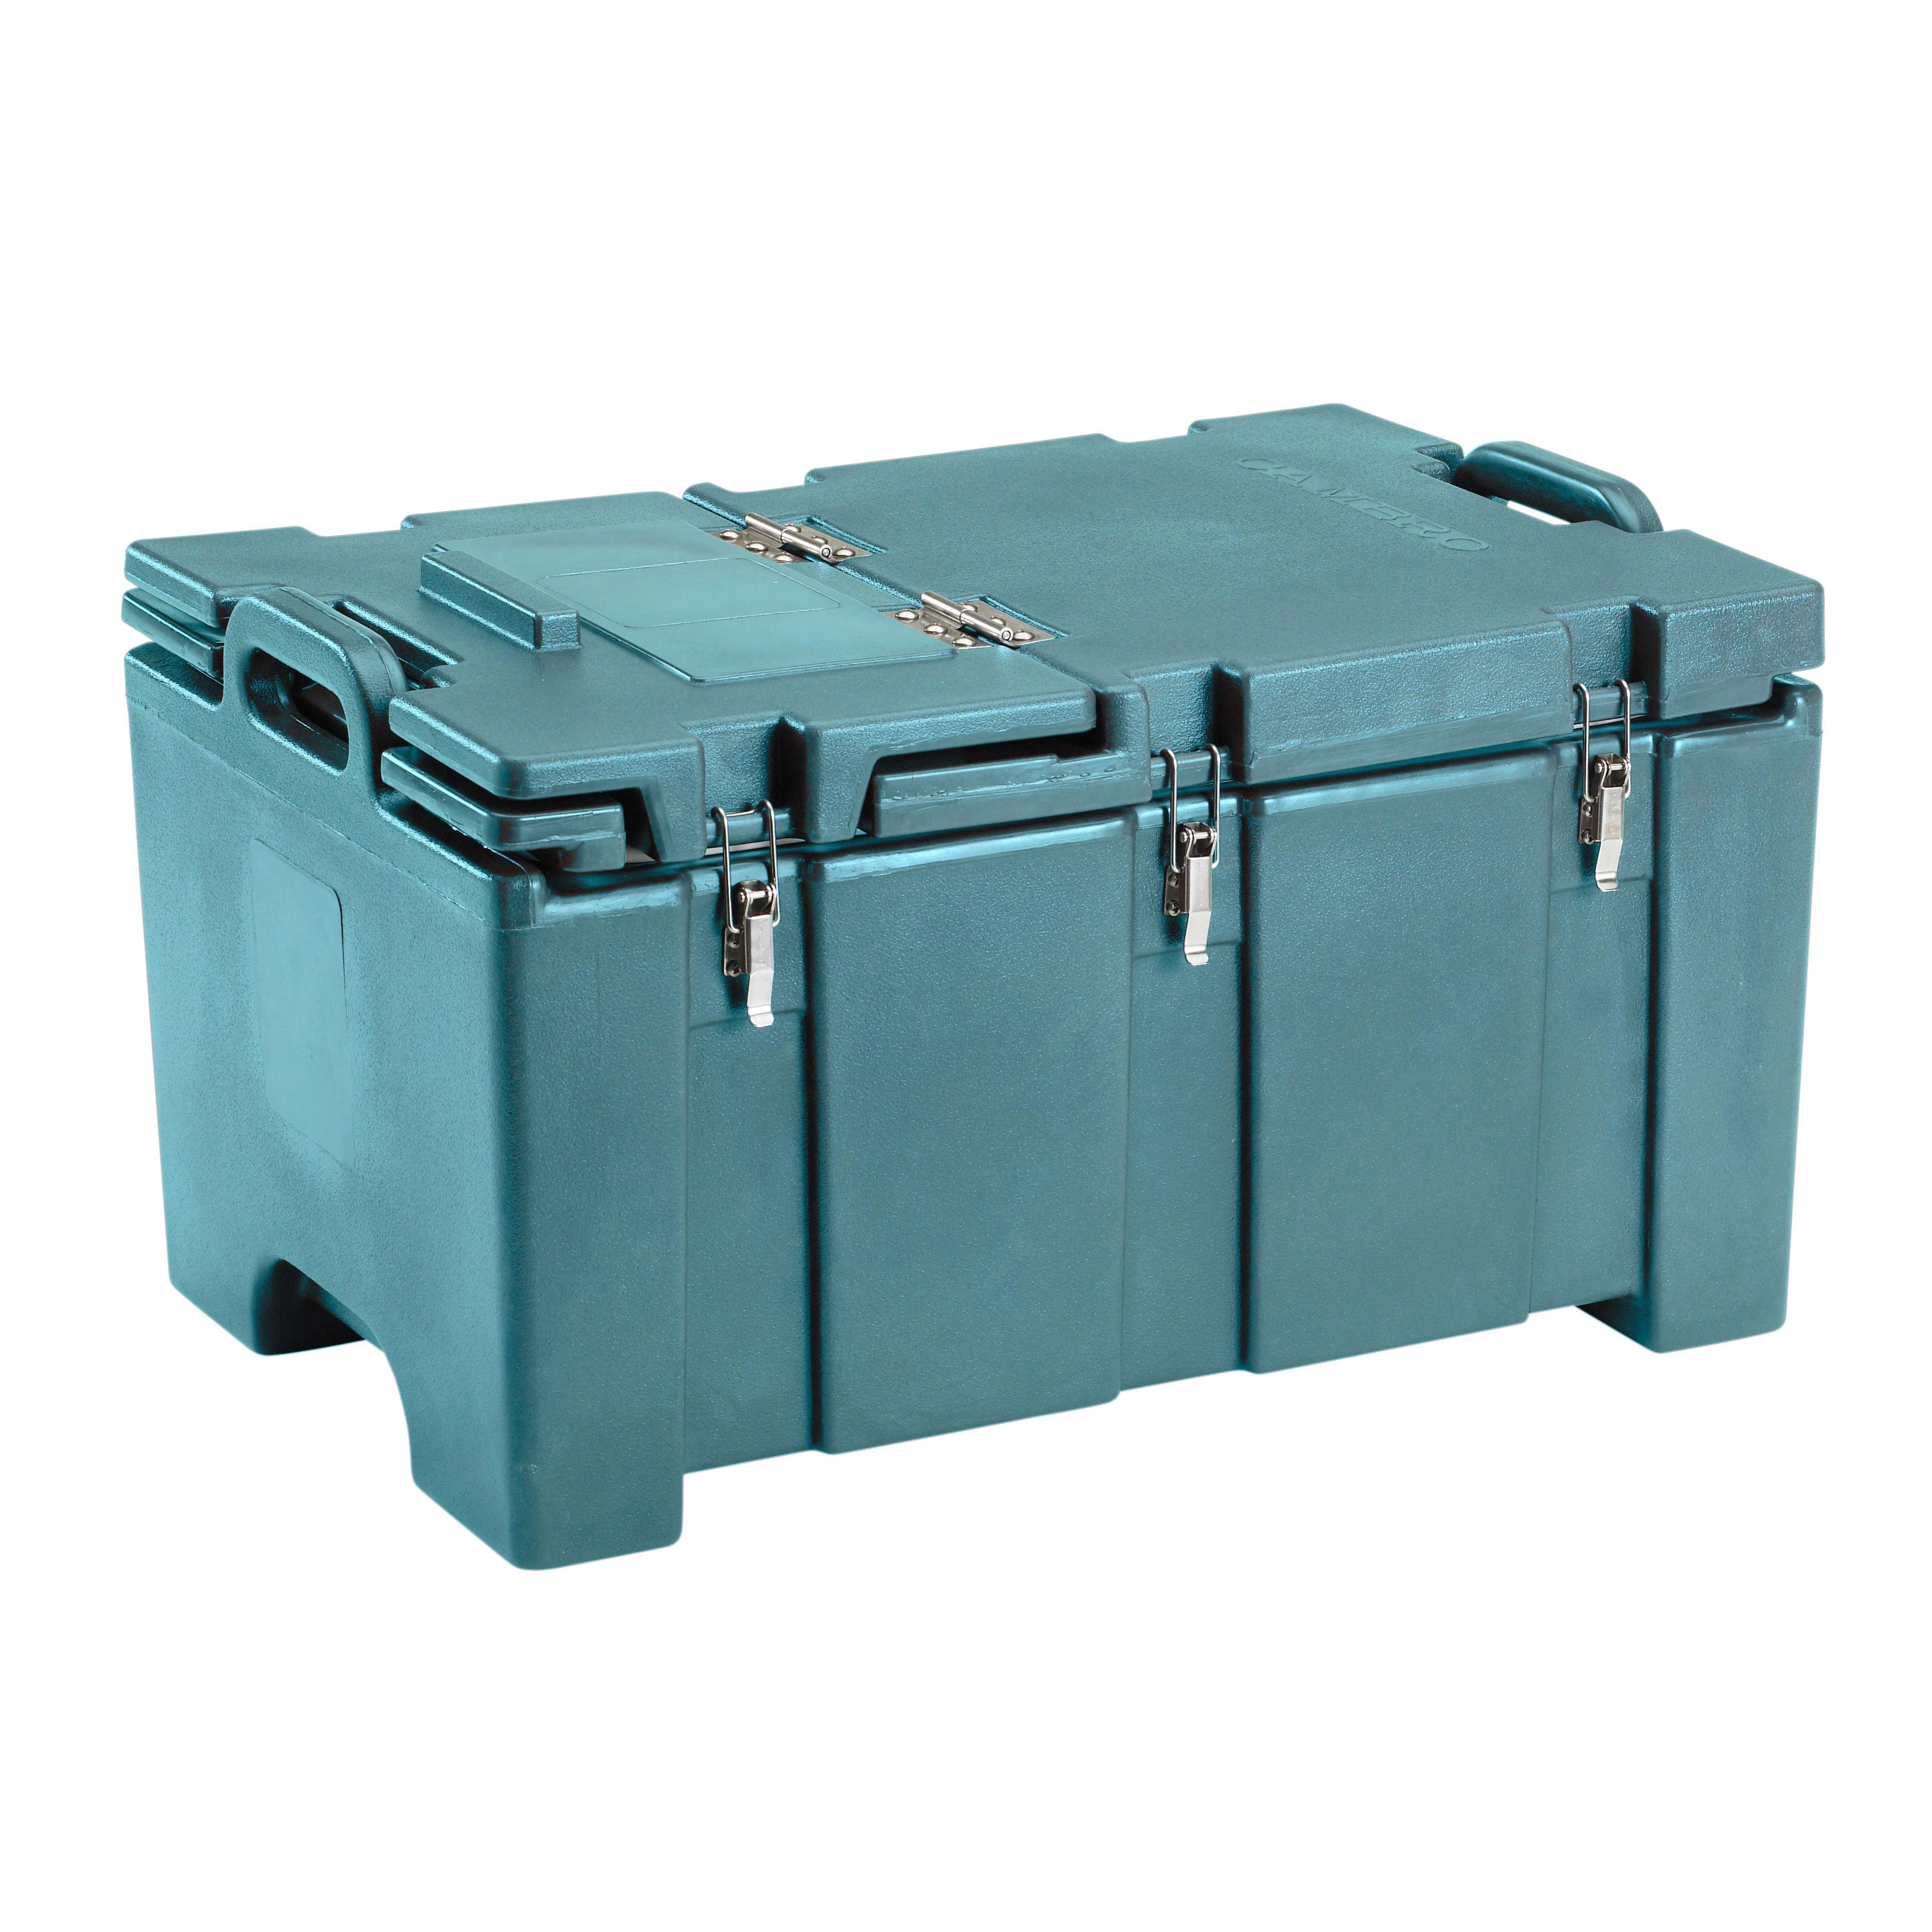 Cambro 100MPCHL401 insulated food storage